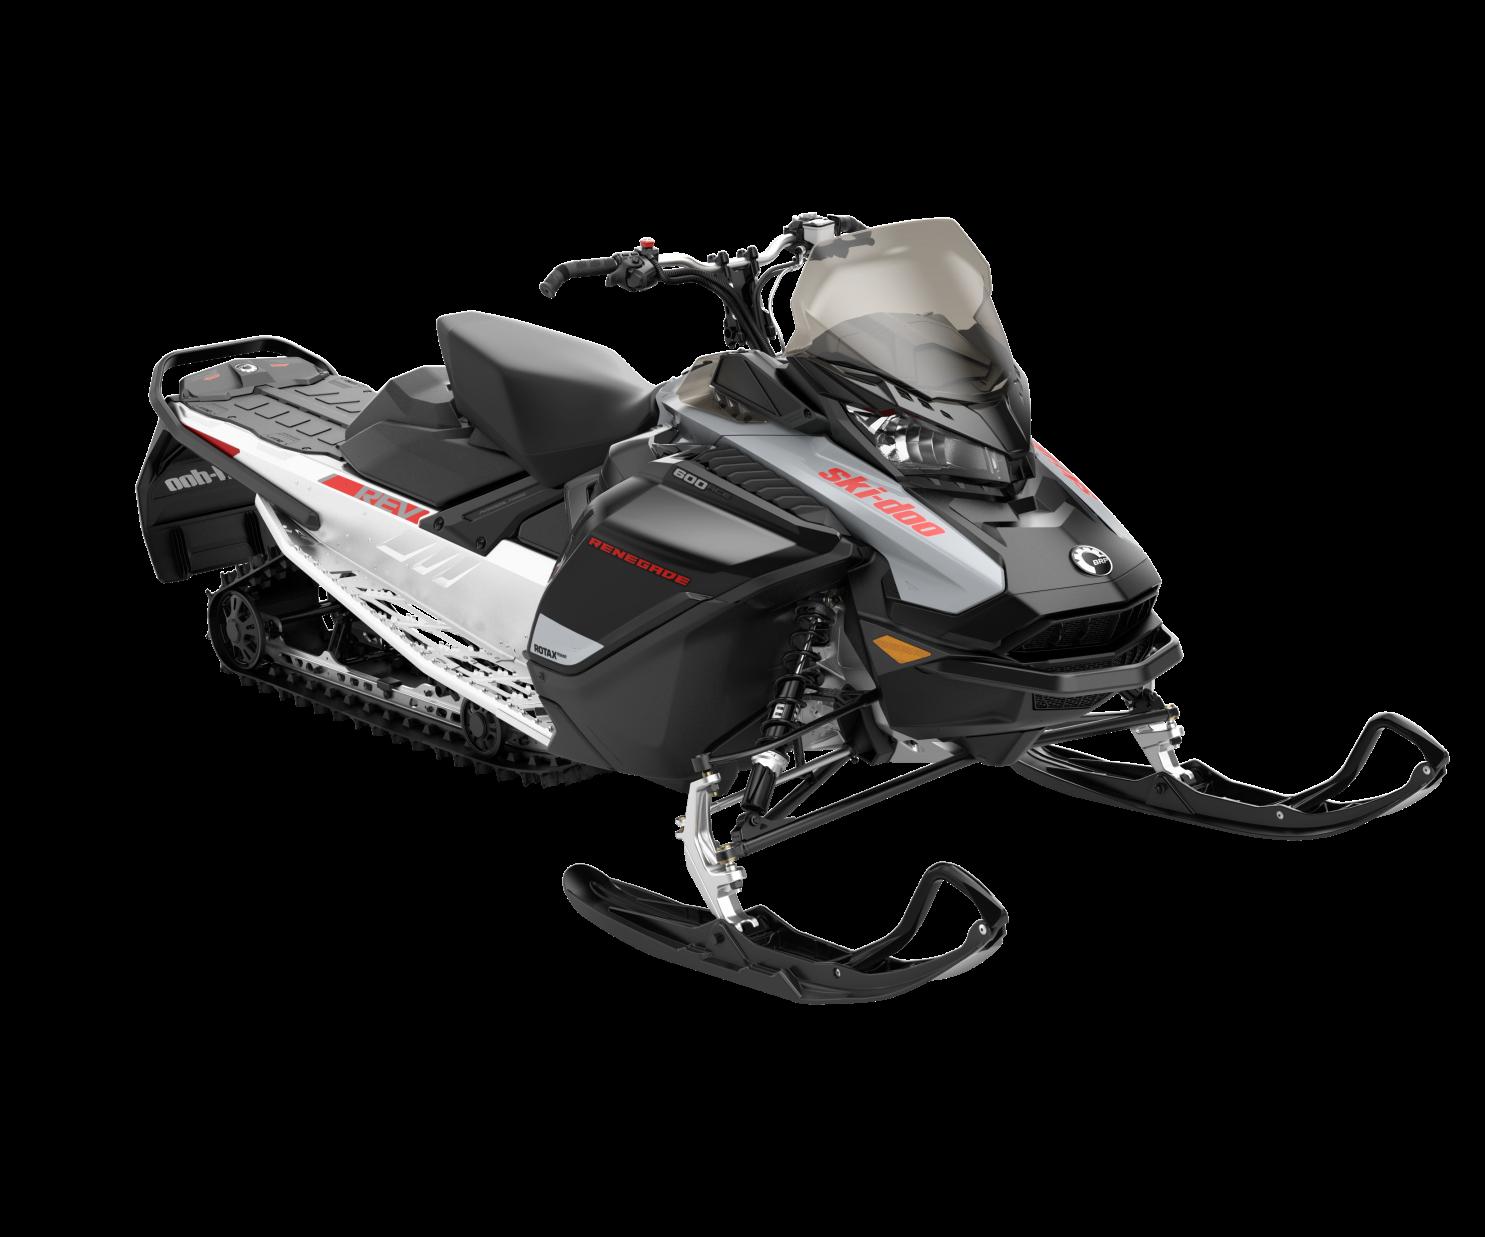 Ski-Doo Renegade Sport 600 ACE ES